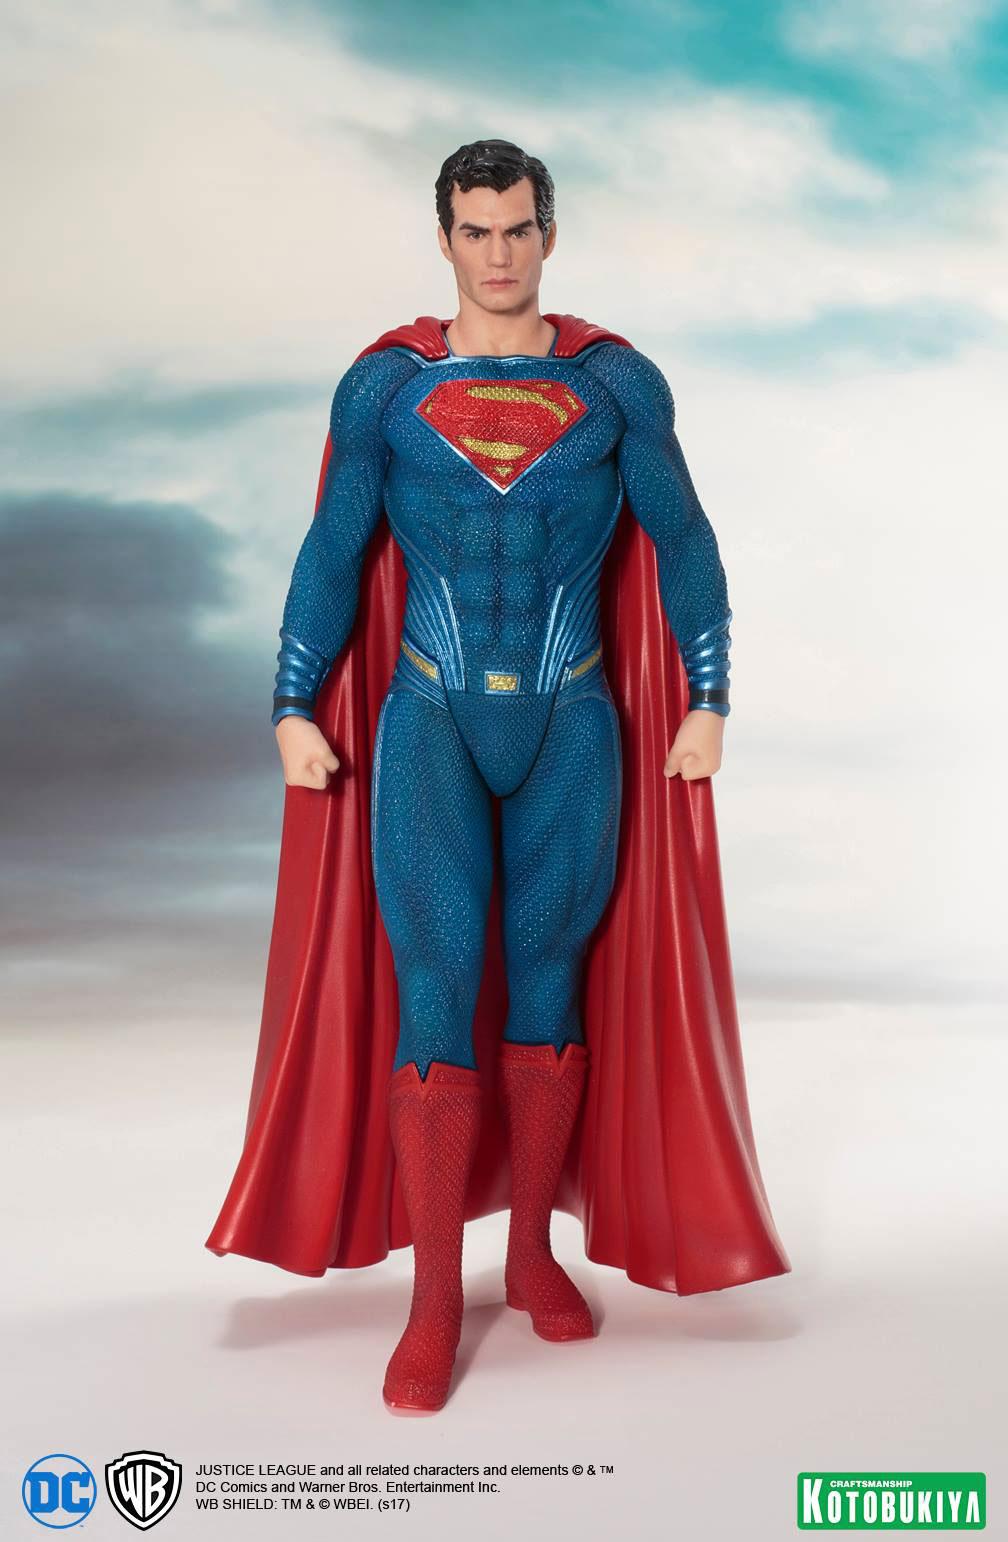 kotobukiya-justice-league-superman-statue